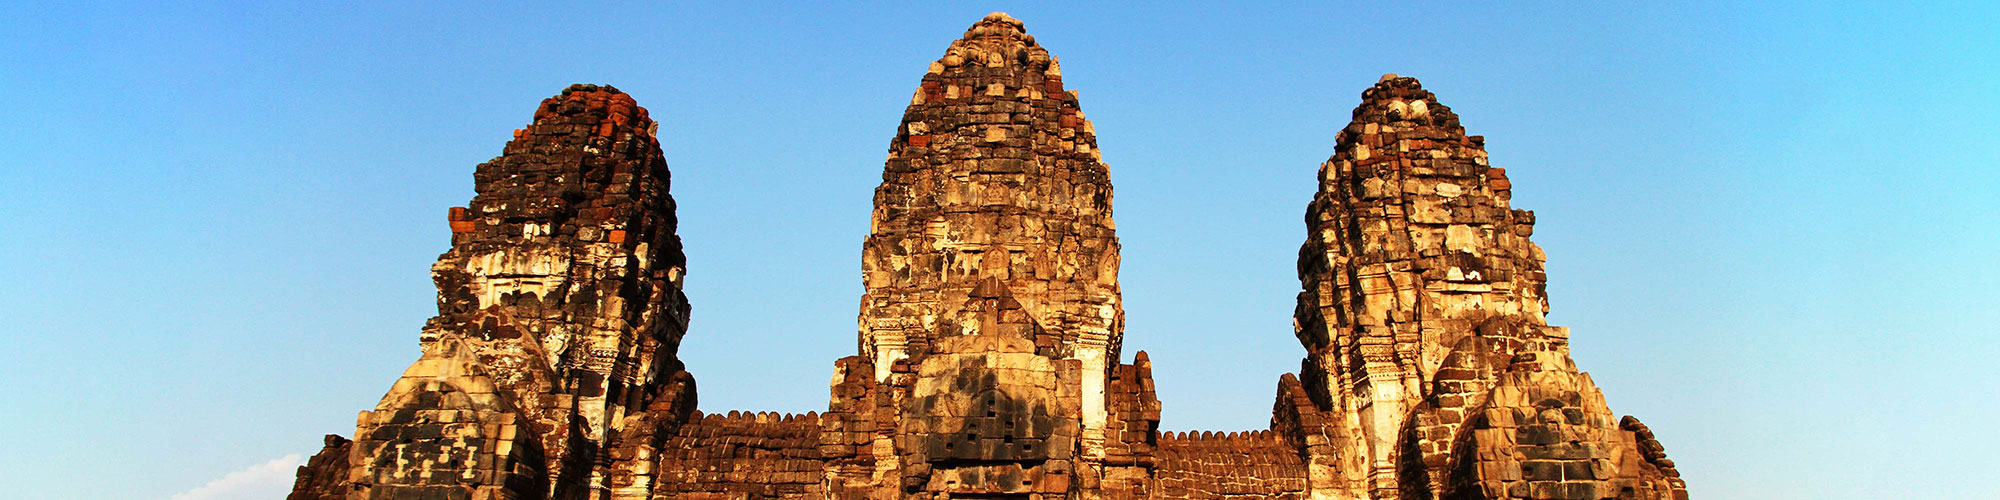 Khmer Monument Symbol of Translation Services